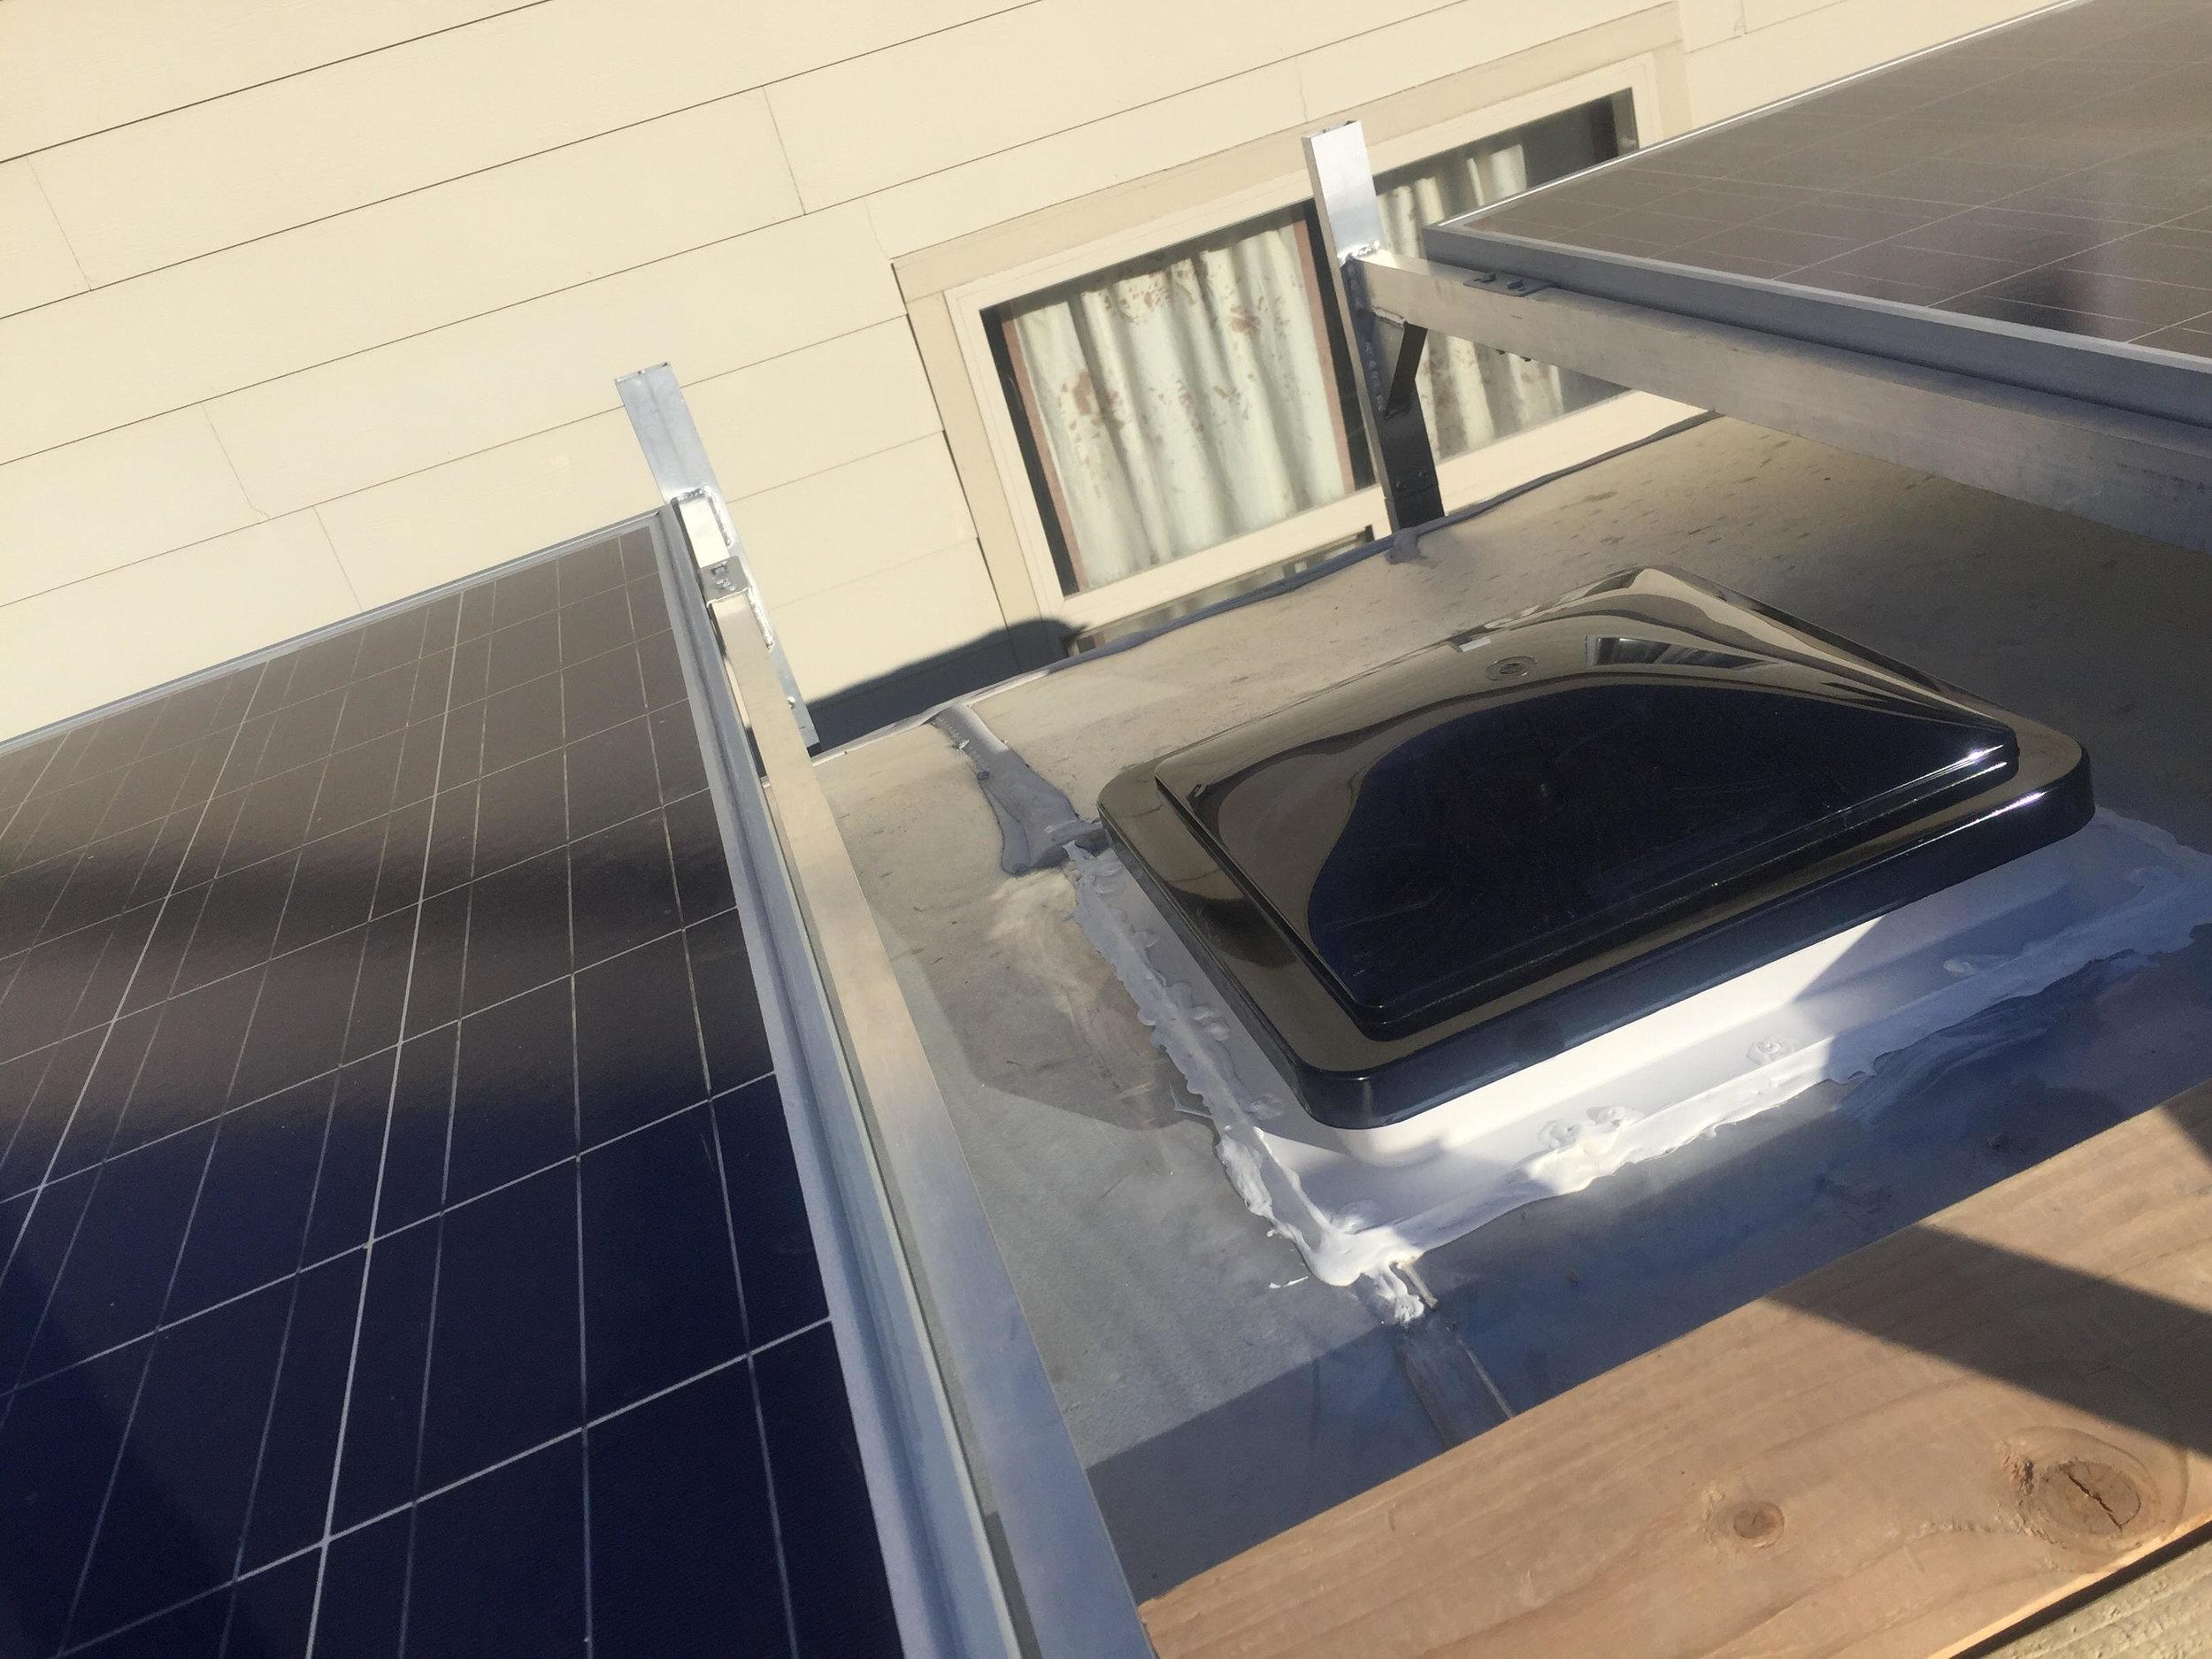 New fantastic fan vent installed